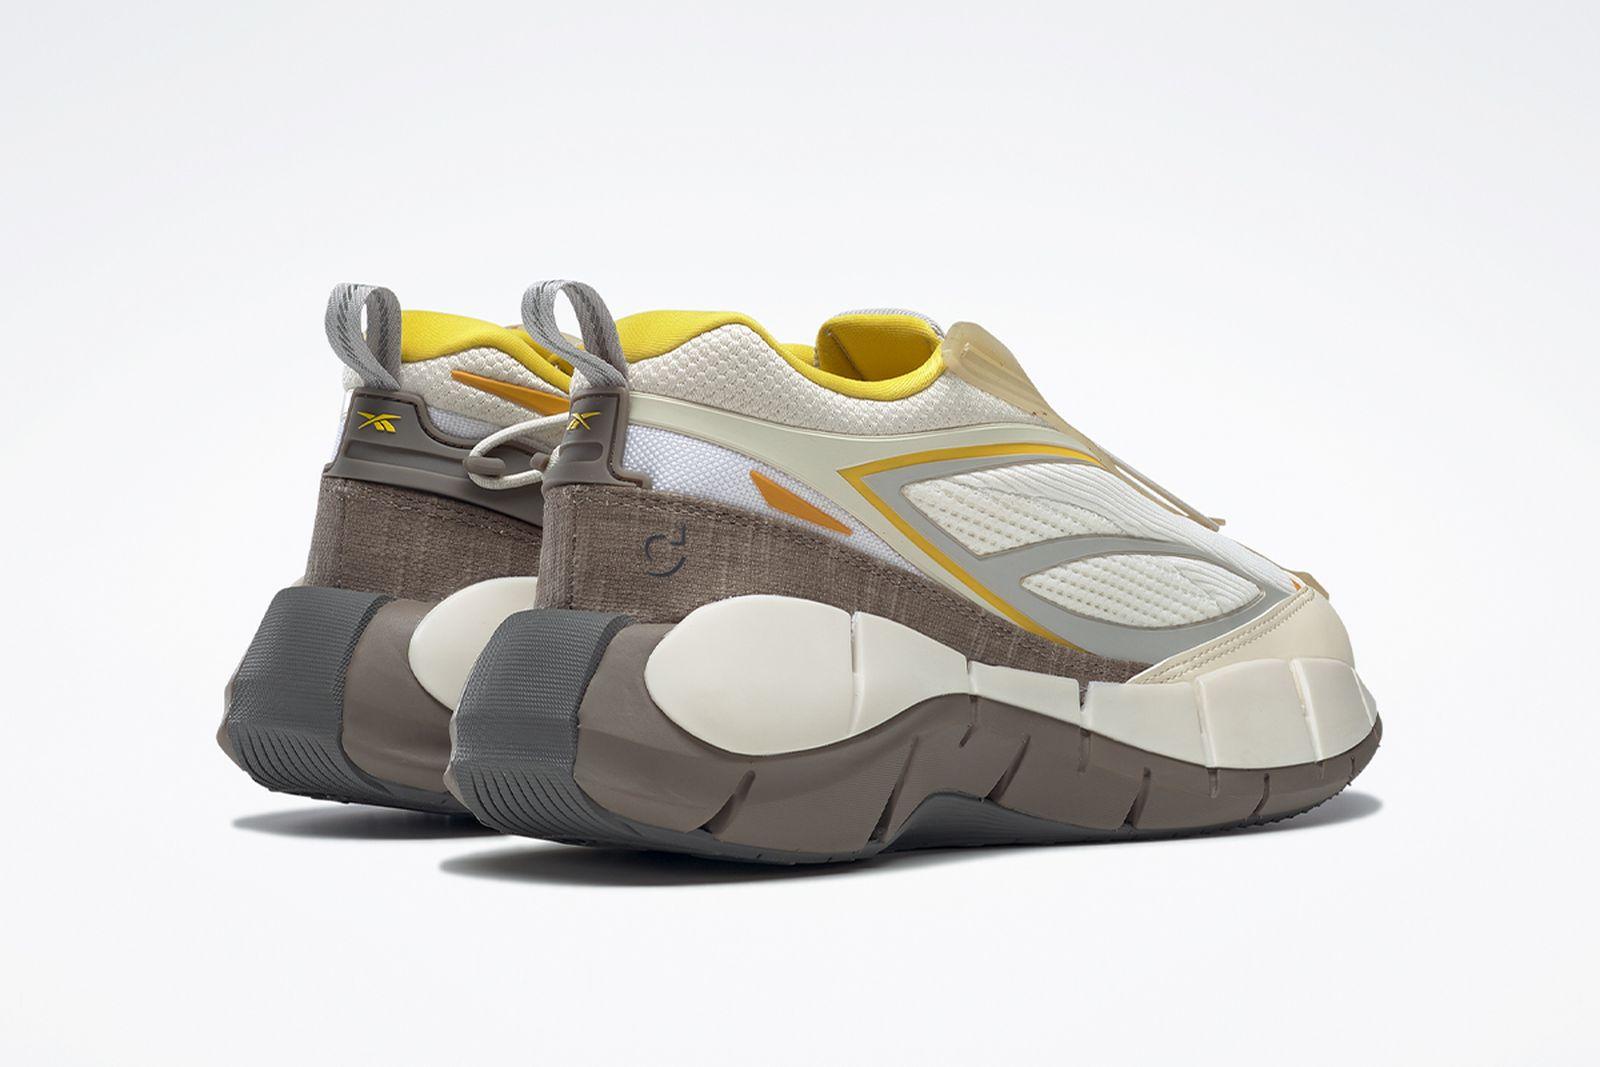 reebok-zig-3d-storm-hydro-alabaster-black-release-date-price-8